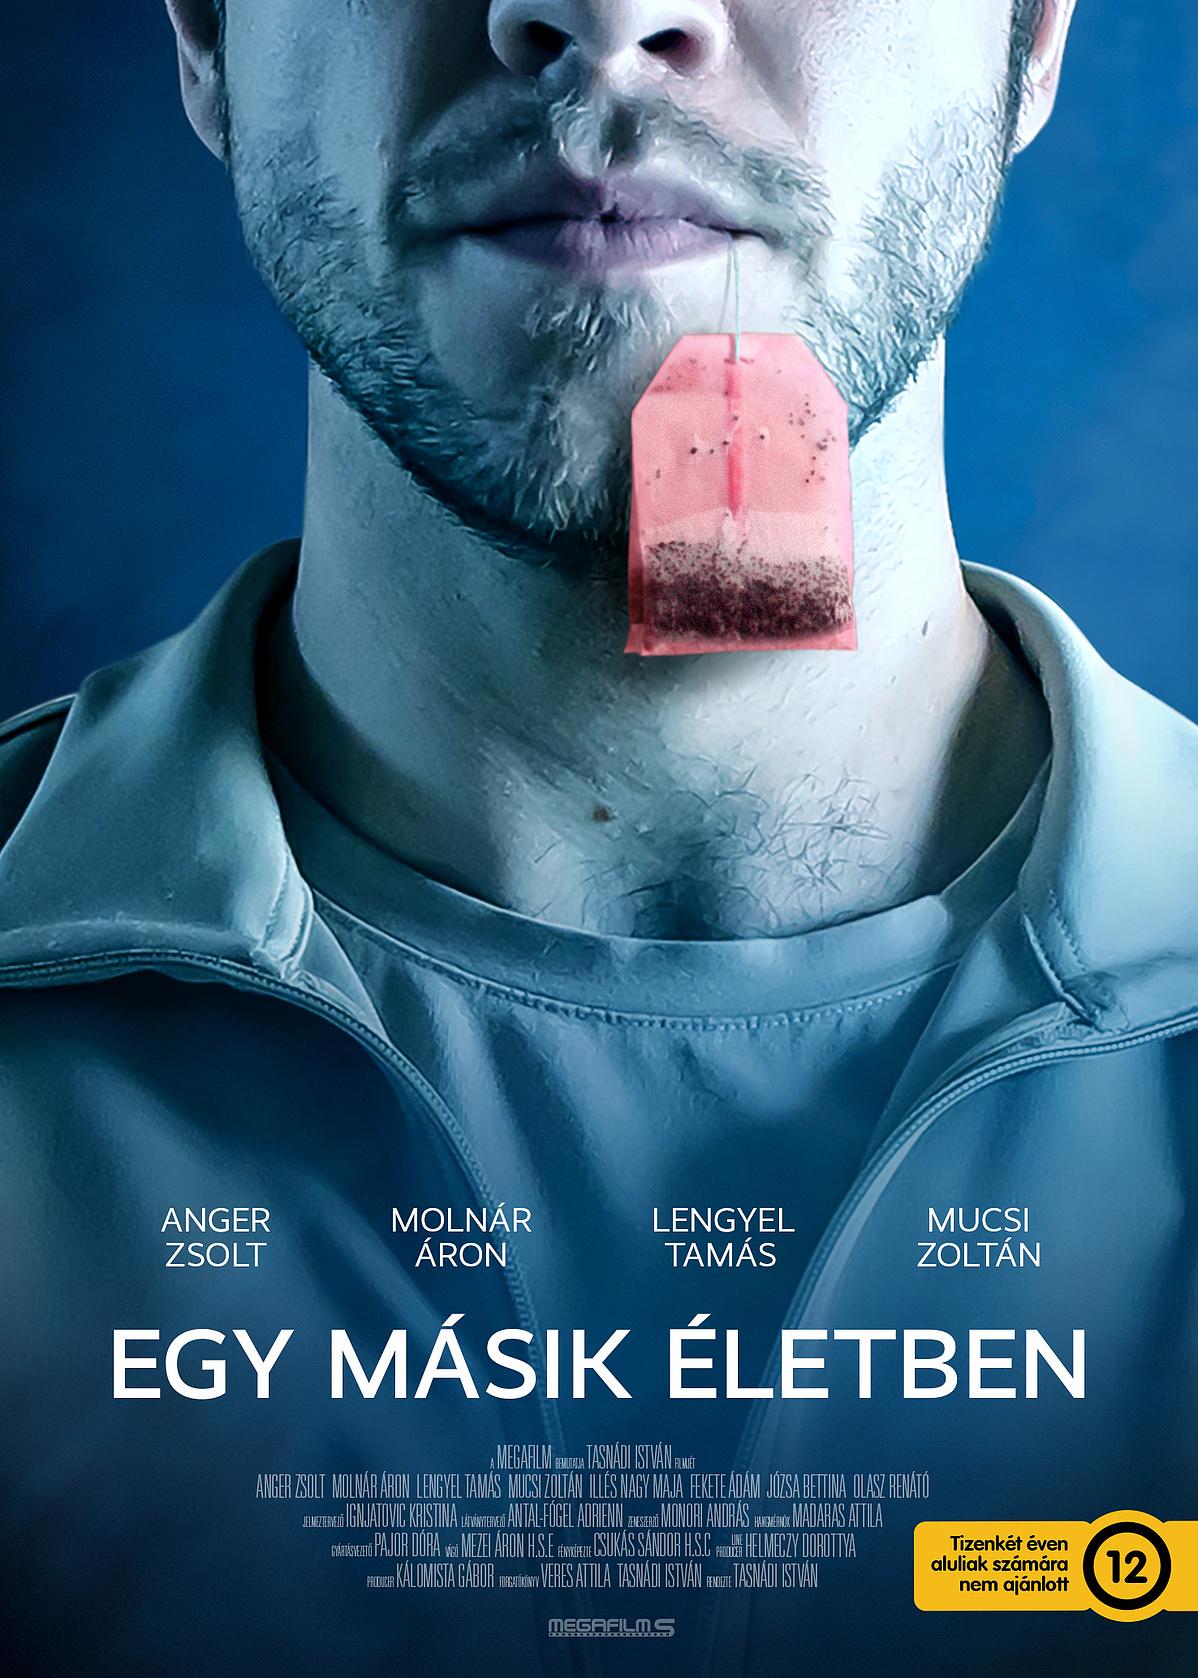 Egy_masik_eletben_poster_B_magyar_online-144544.jpg